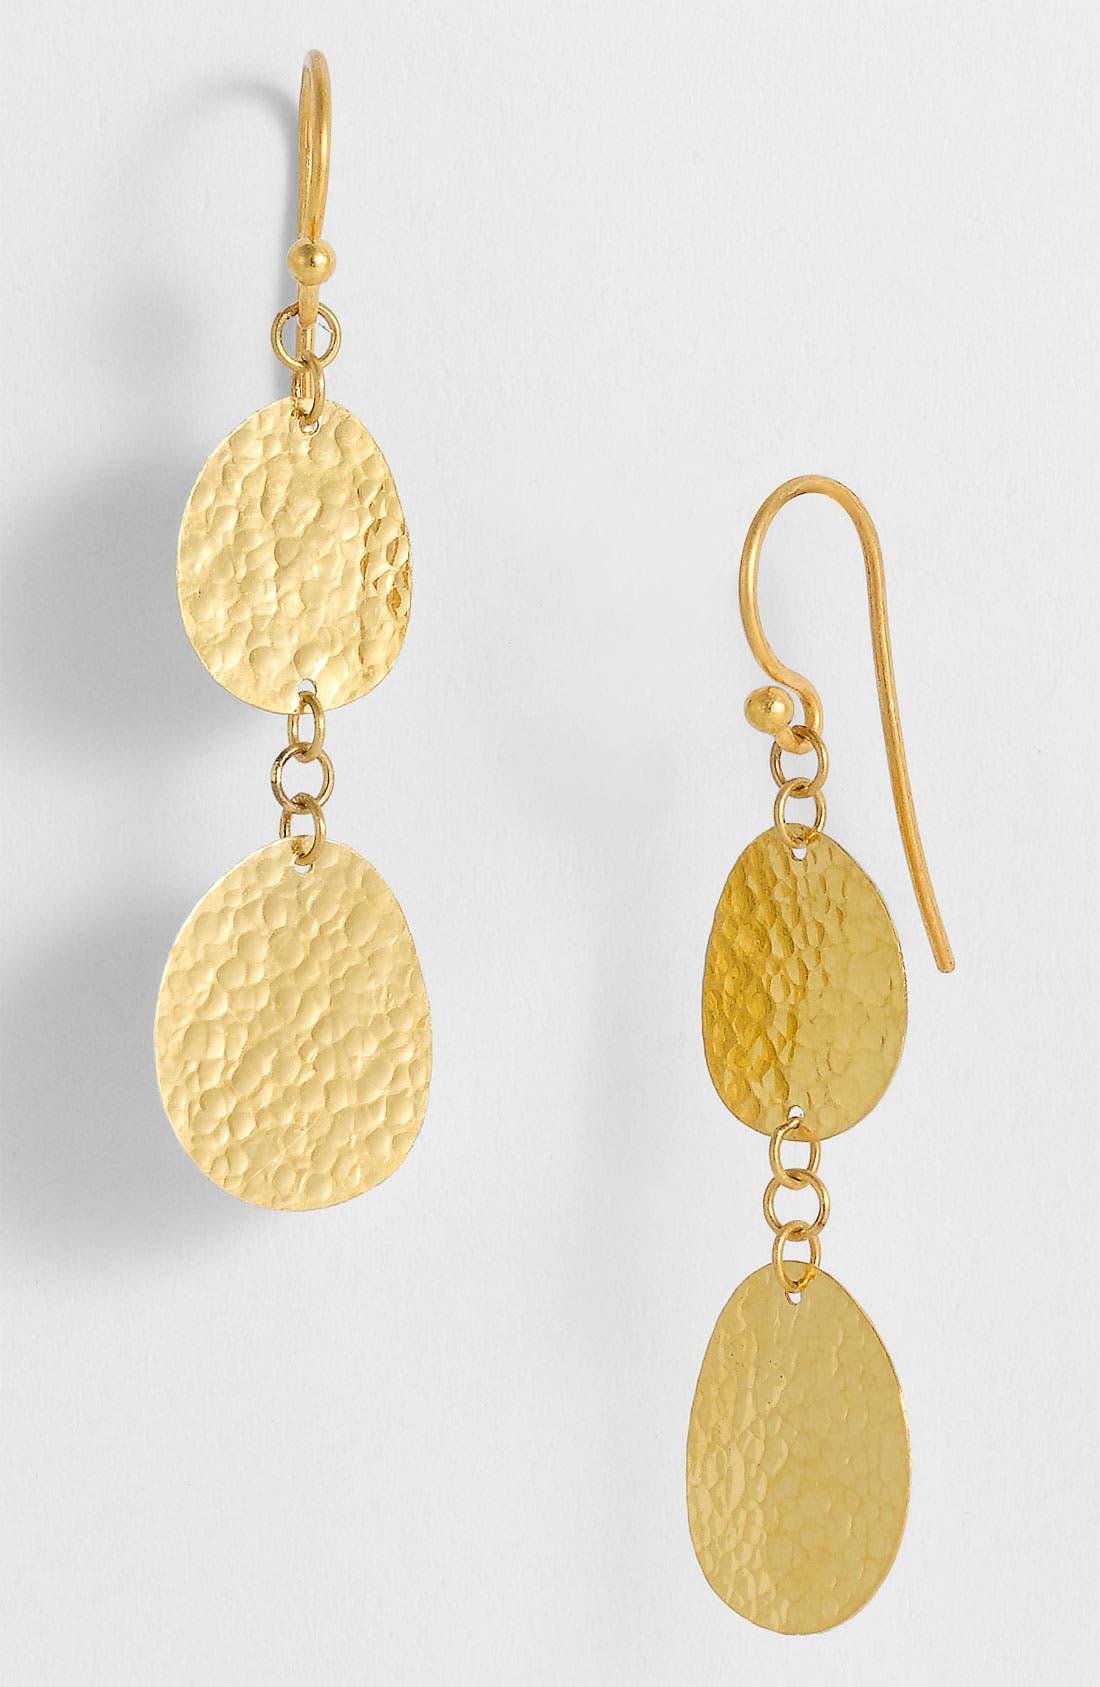 Alternate Image 1 Selected - Gurhan 'Contour' Double Drop Gold Earrings